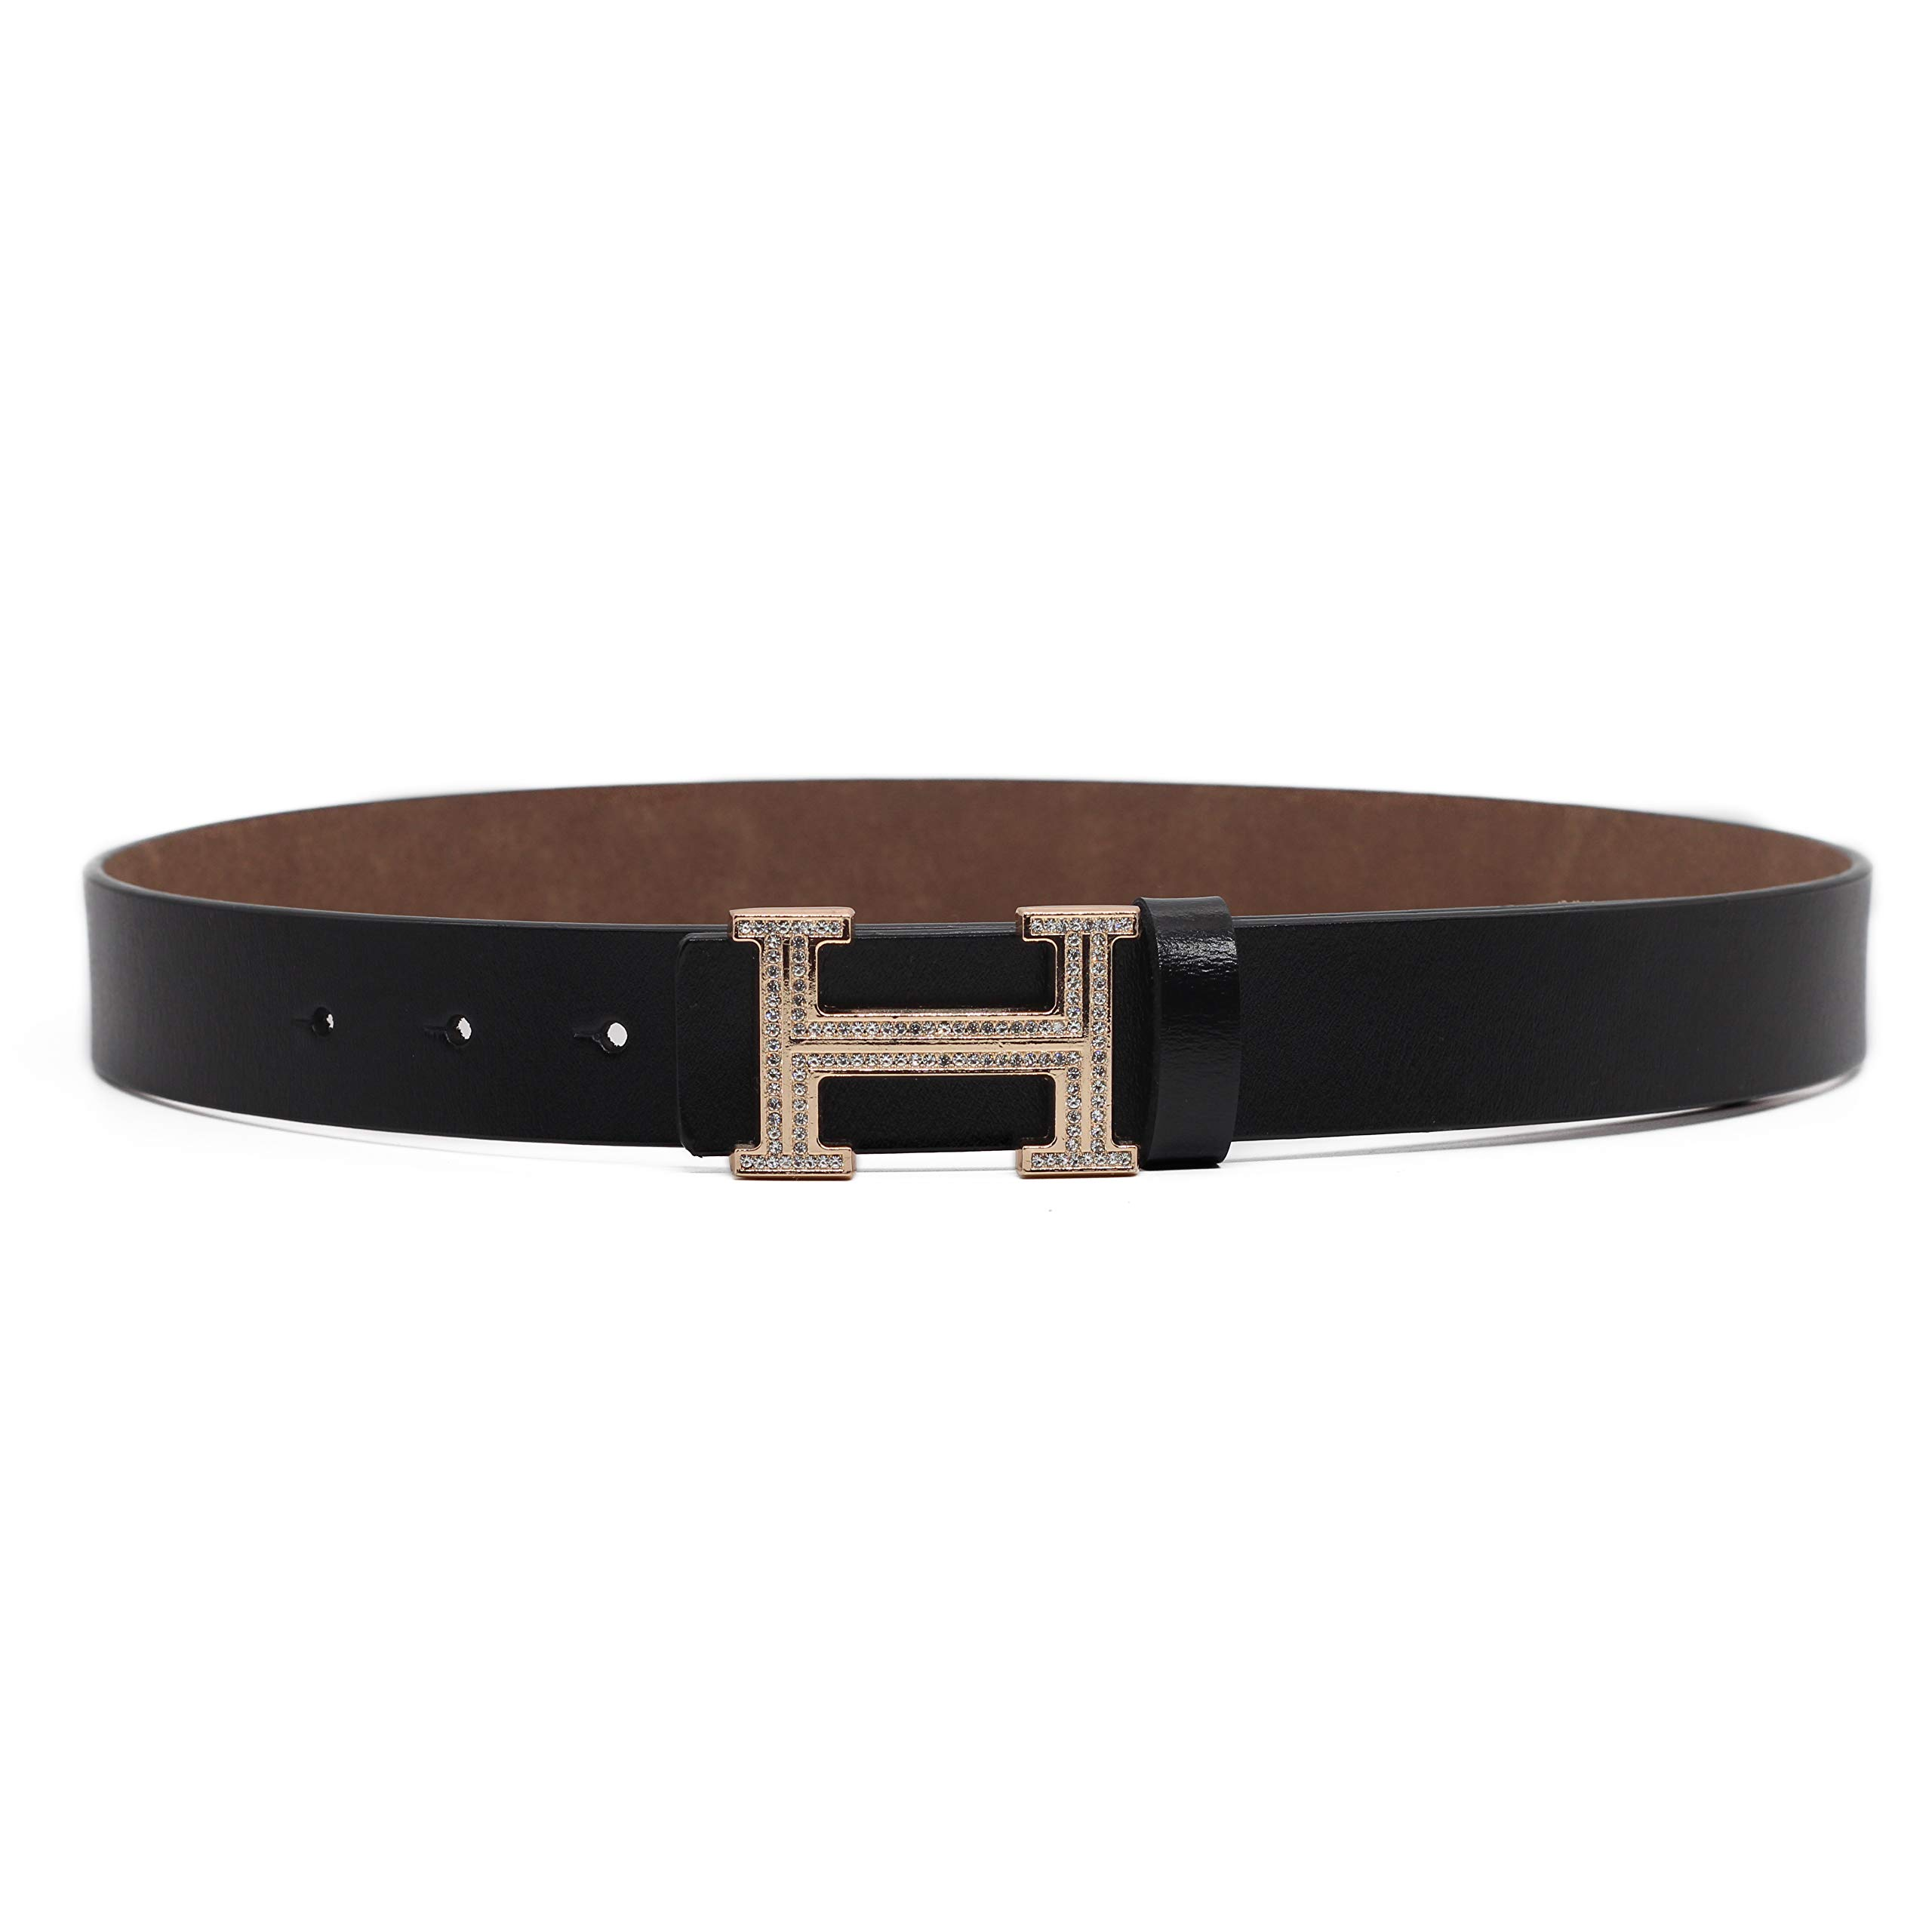 Women's Cowhide Leather Belt Fashion Buckle for Pants Jeans Shorts Ladies Design Genuine Belts (110cm/43.3'', pants size 29''-34'', Style 2- Black) by DUOAI (Image #2)